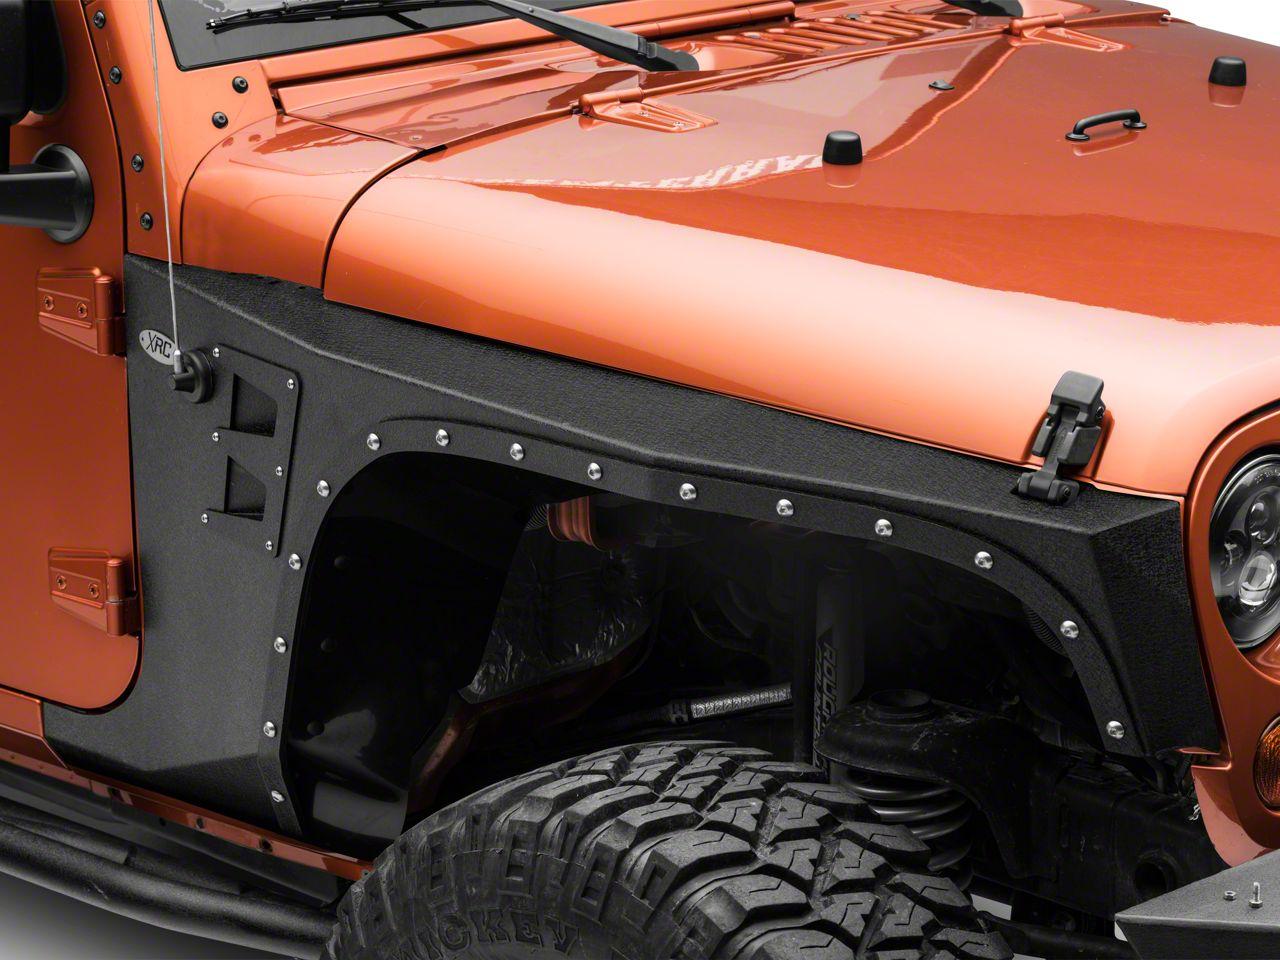 Smittybilt XRC Front Fenders - Black Textured (07-18 Jeep Wrangler JK)